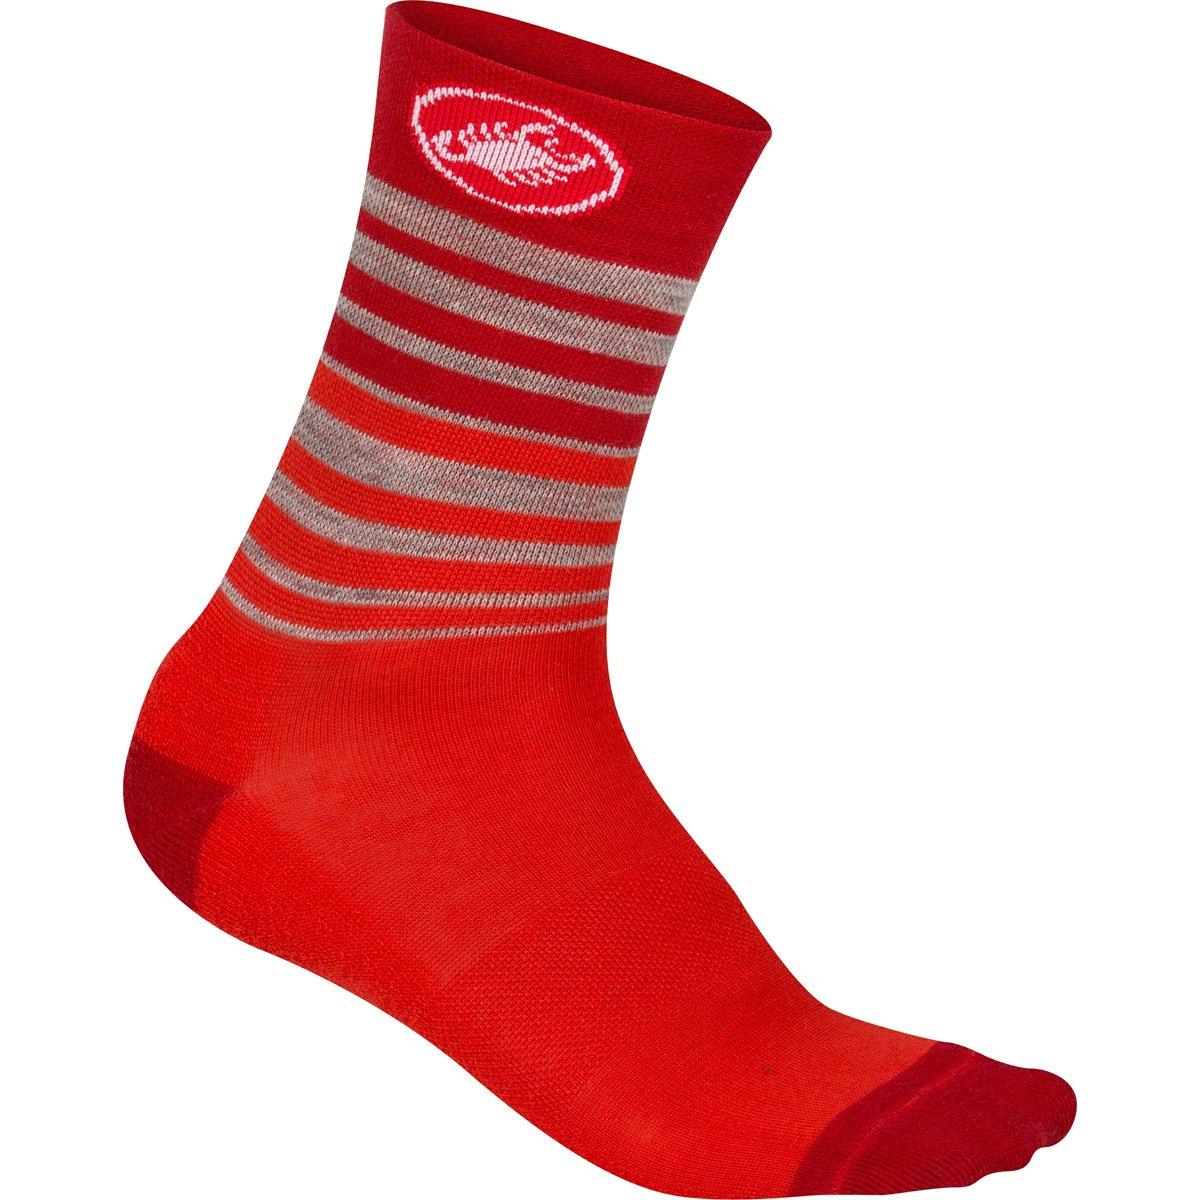 Castelli 2015 / 16 Women 's Righina 13 Cycling Sock – r15576 B01KYLI1PK Medium レッド レッド Medium